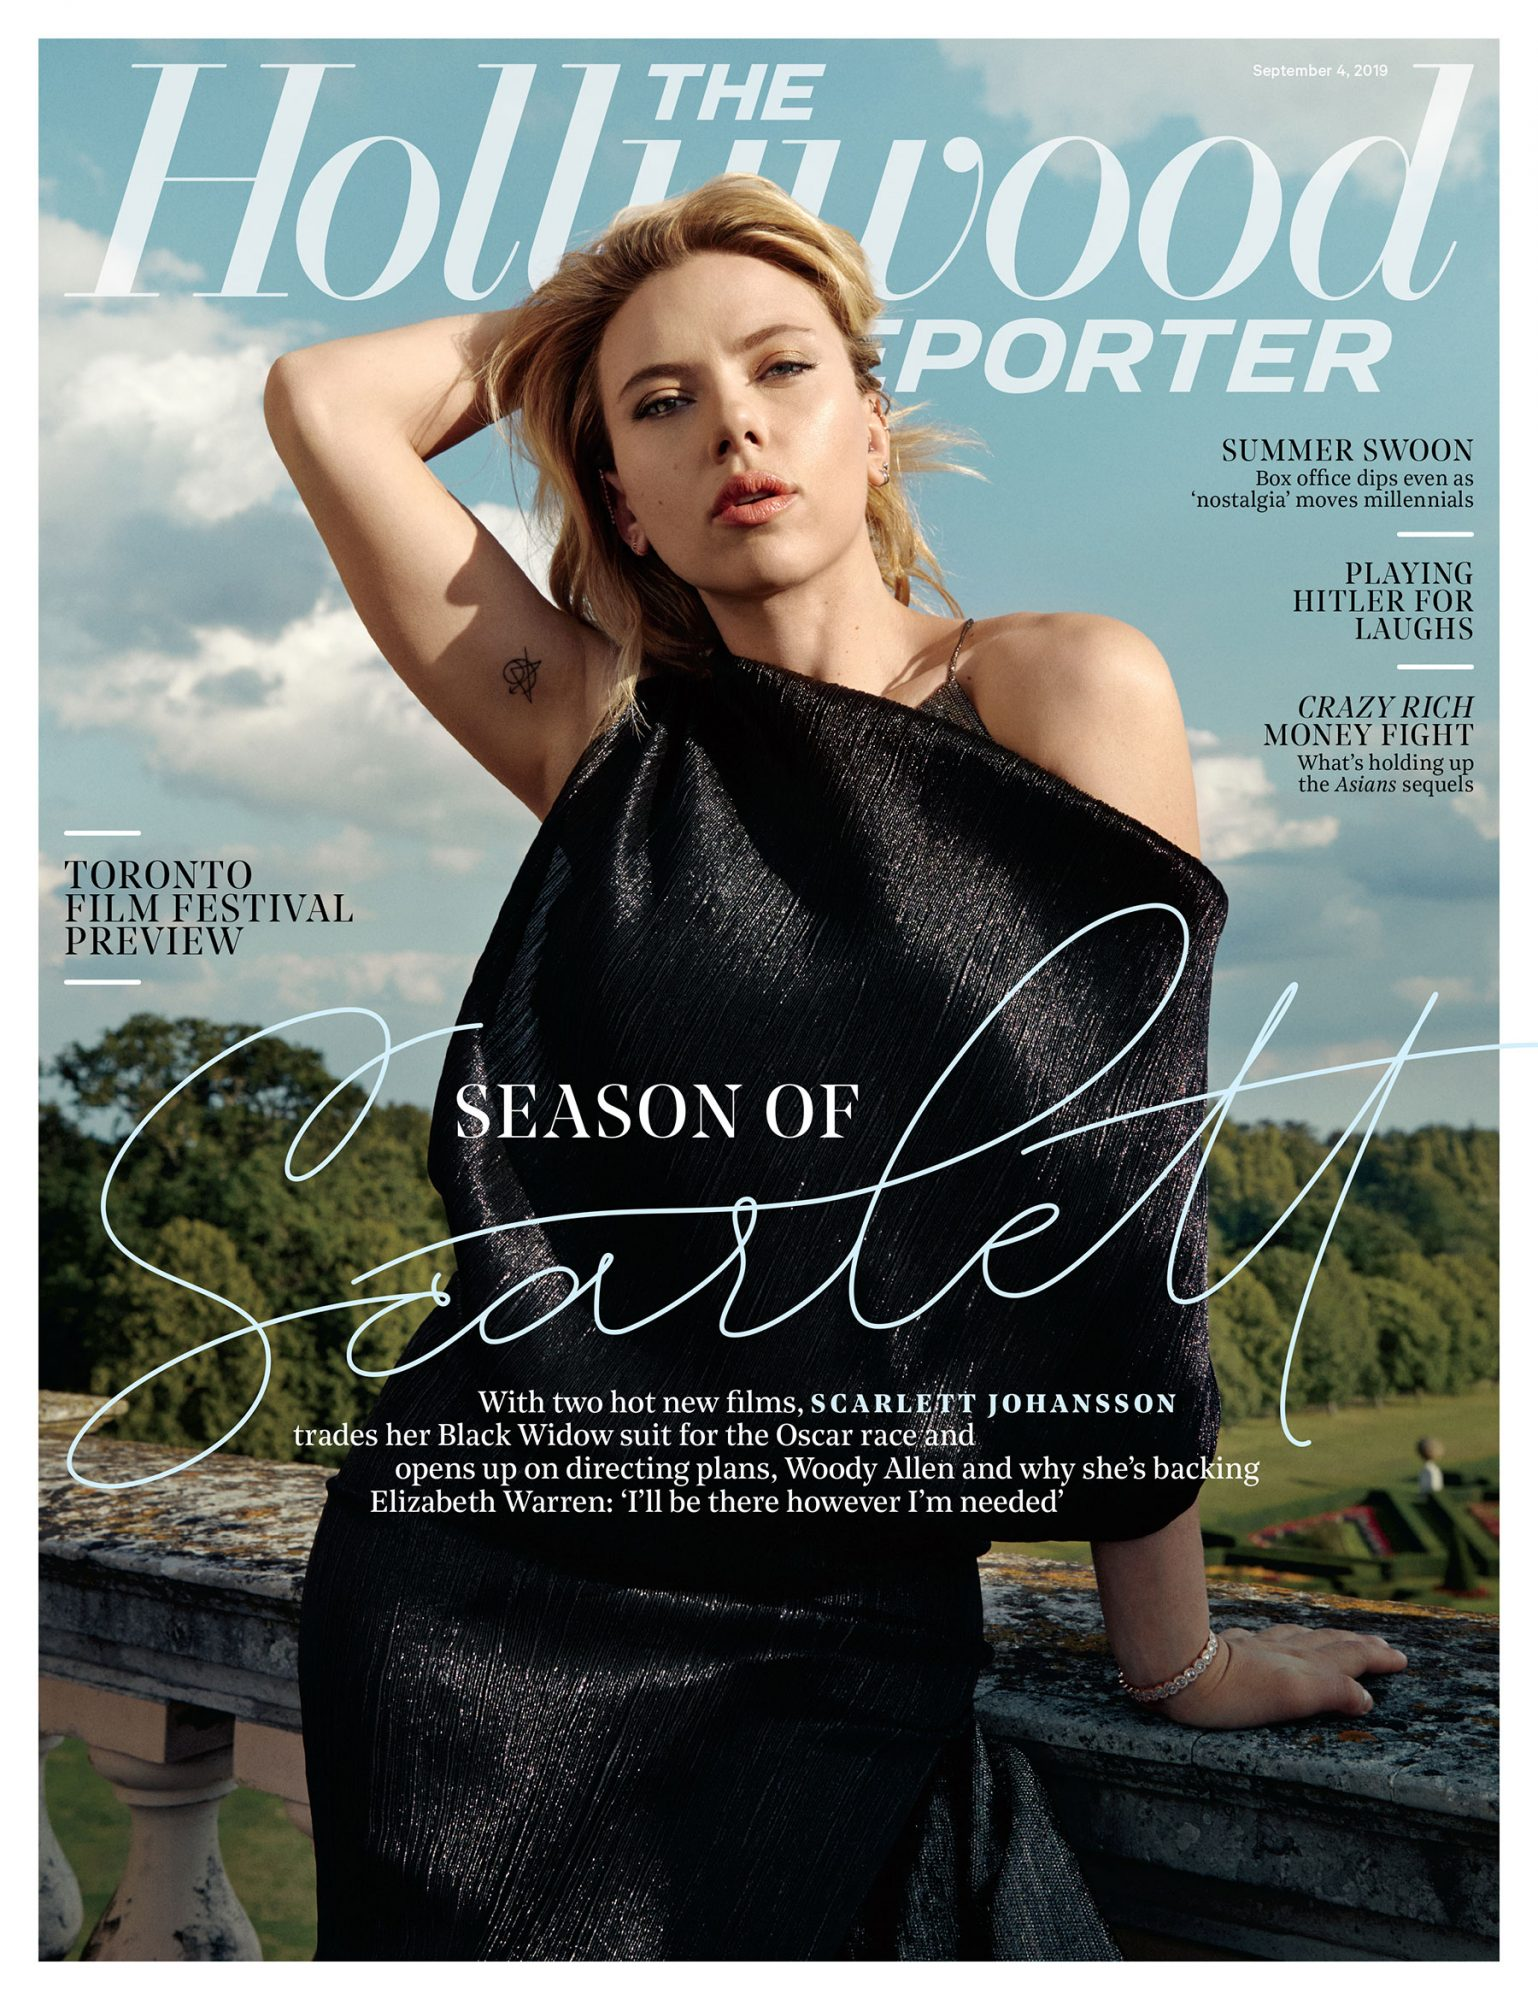 The Hollywood Reporter Scarlett Johansson cover